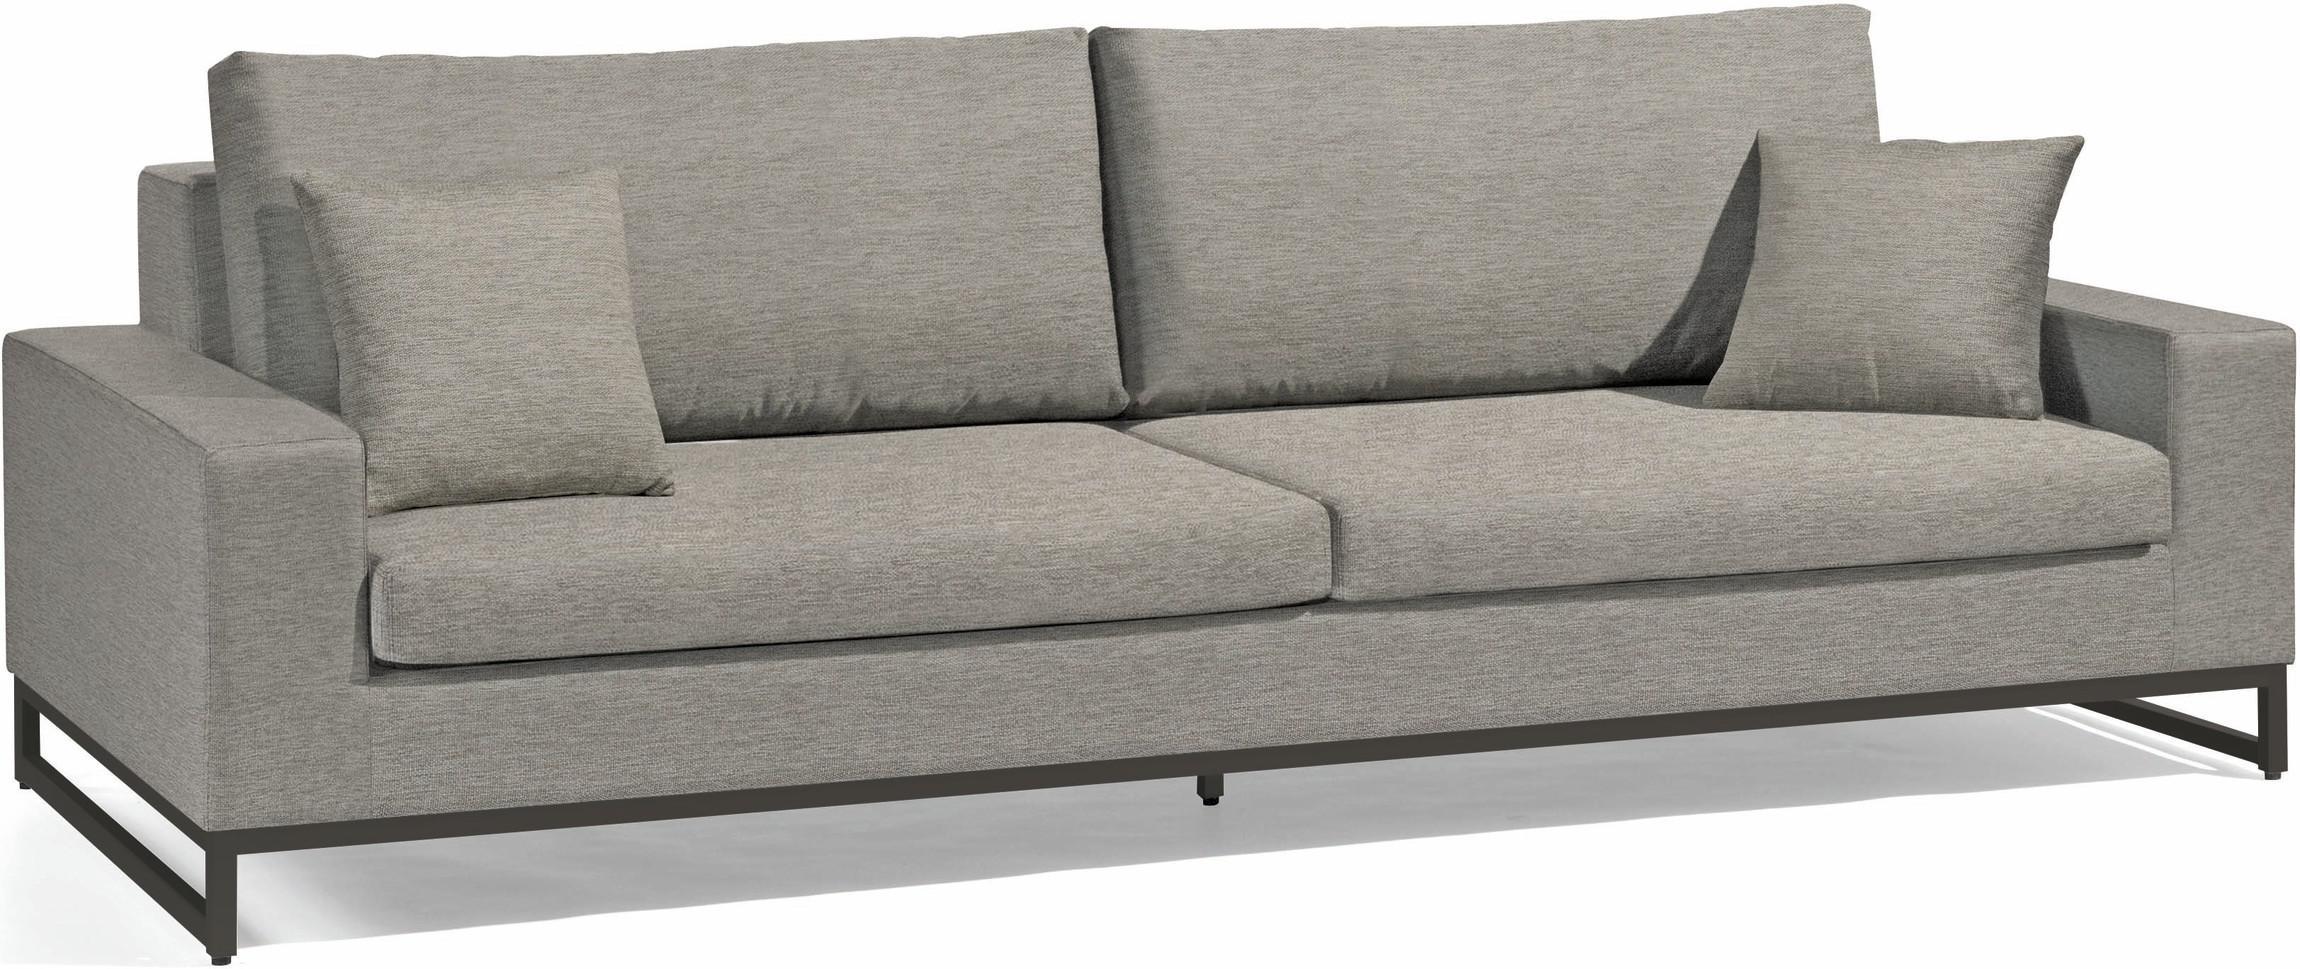 Full Size of Outdoor Sofa Wetterfest Ikea Couch Lounge Zendo Lavagrau Lotus Sparrow Manutti Koinor Big Mit Schlaffunktion Xxl Grau Günstig Himolla Ebay Kolonialstil Wohnzimmer Outdoor Sofa Wetterfest